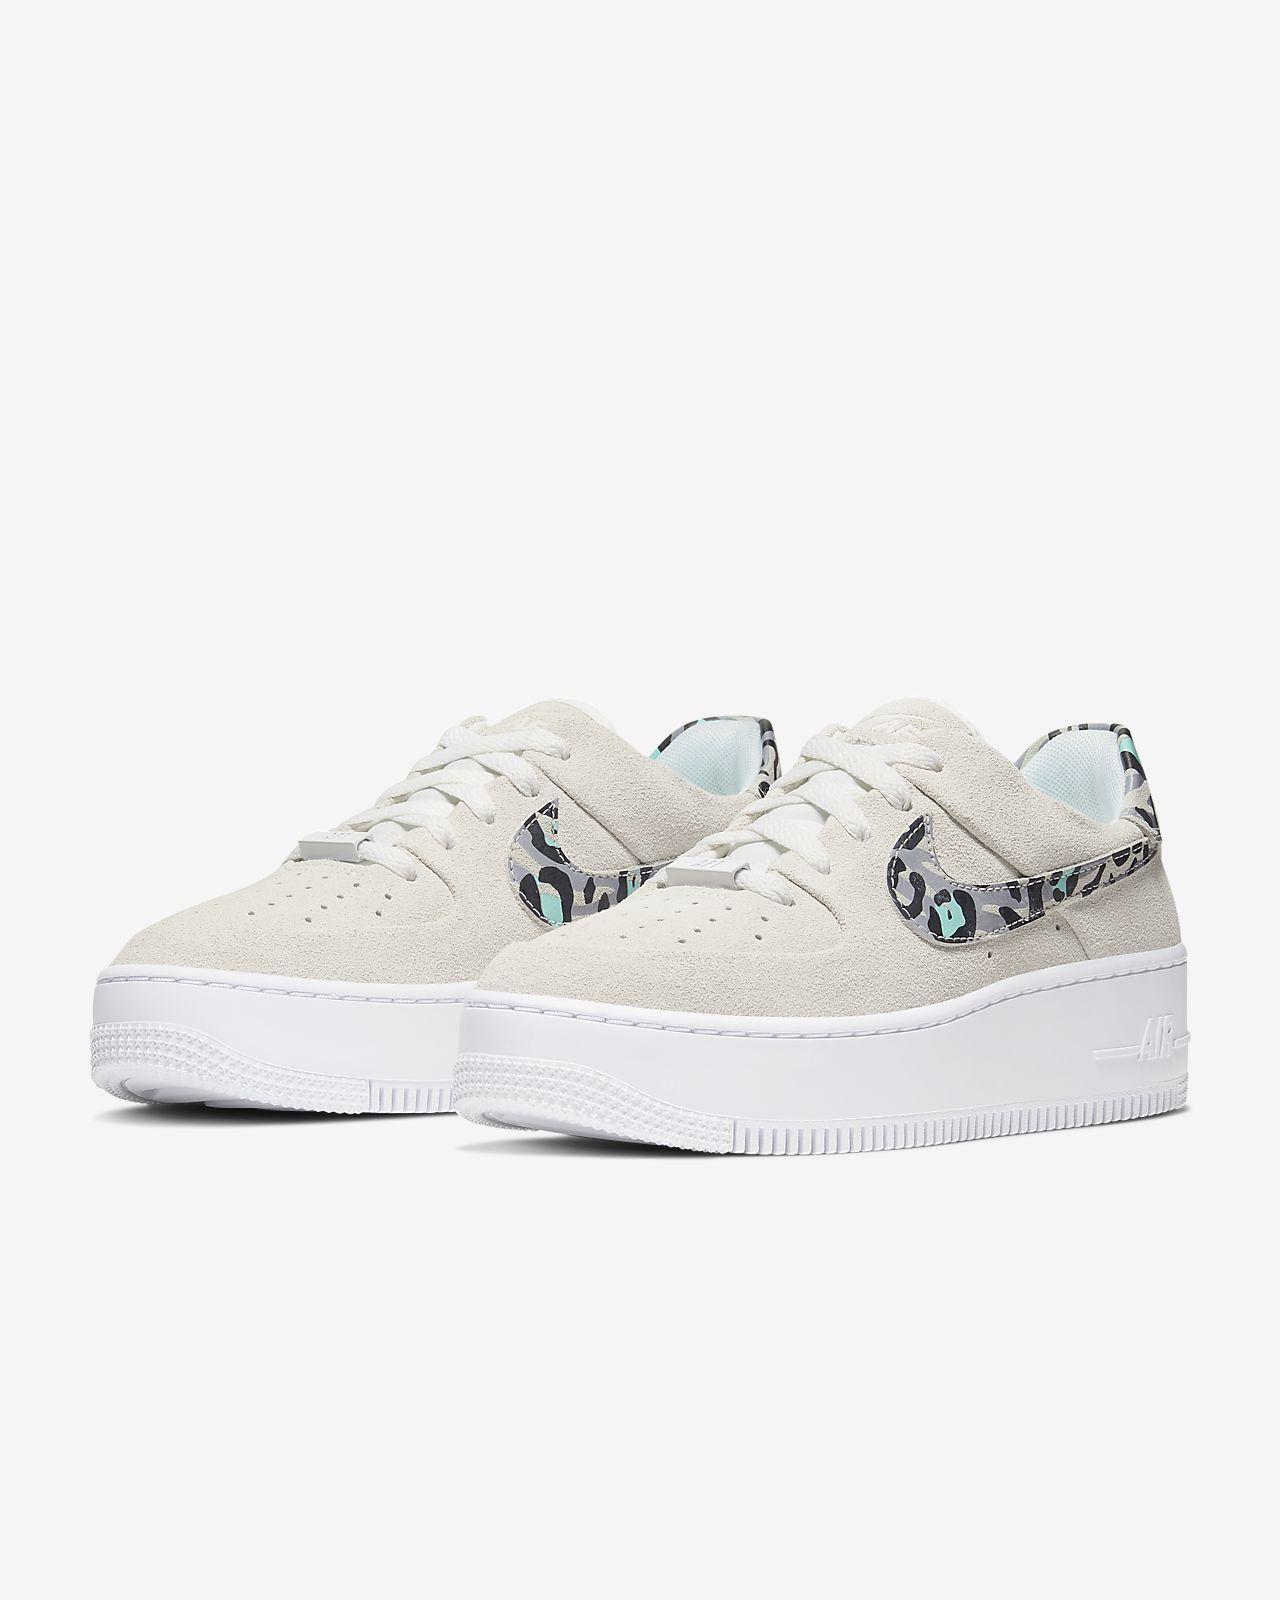 Nike Air Force 1 Sage Low Damesschoen Top 10